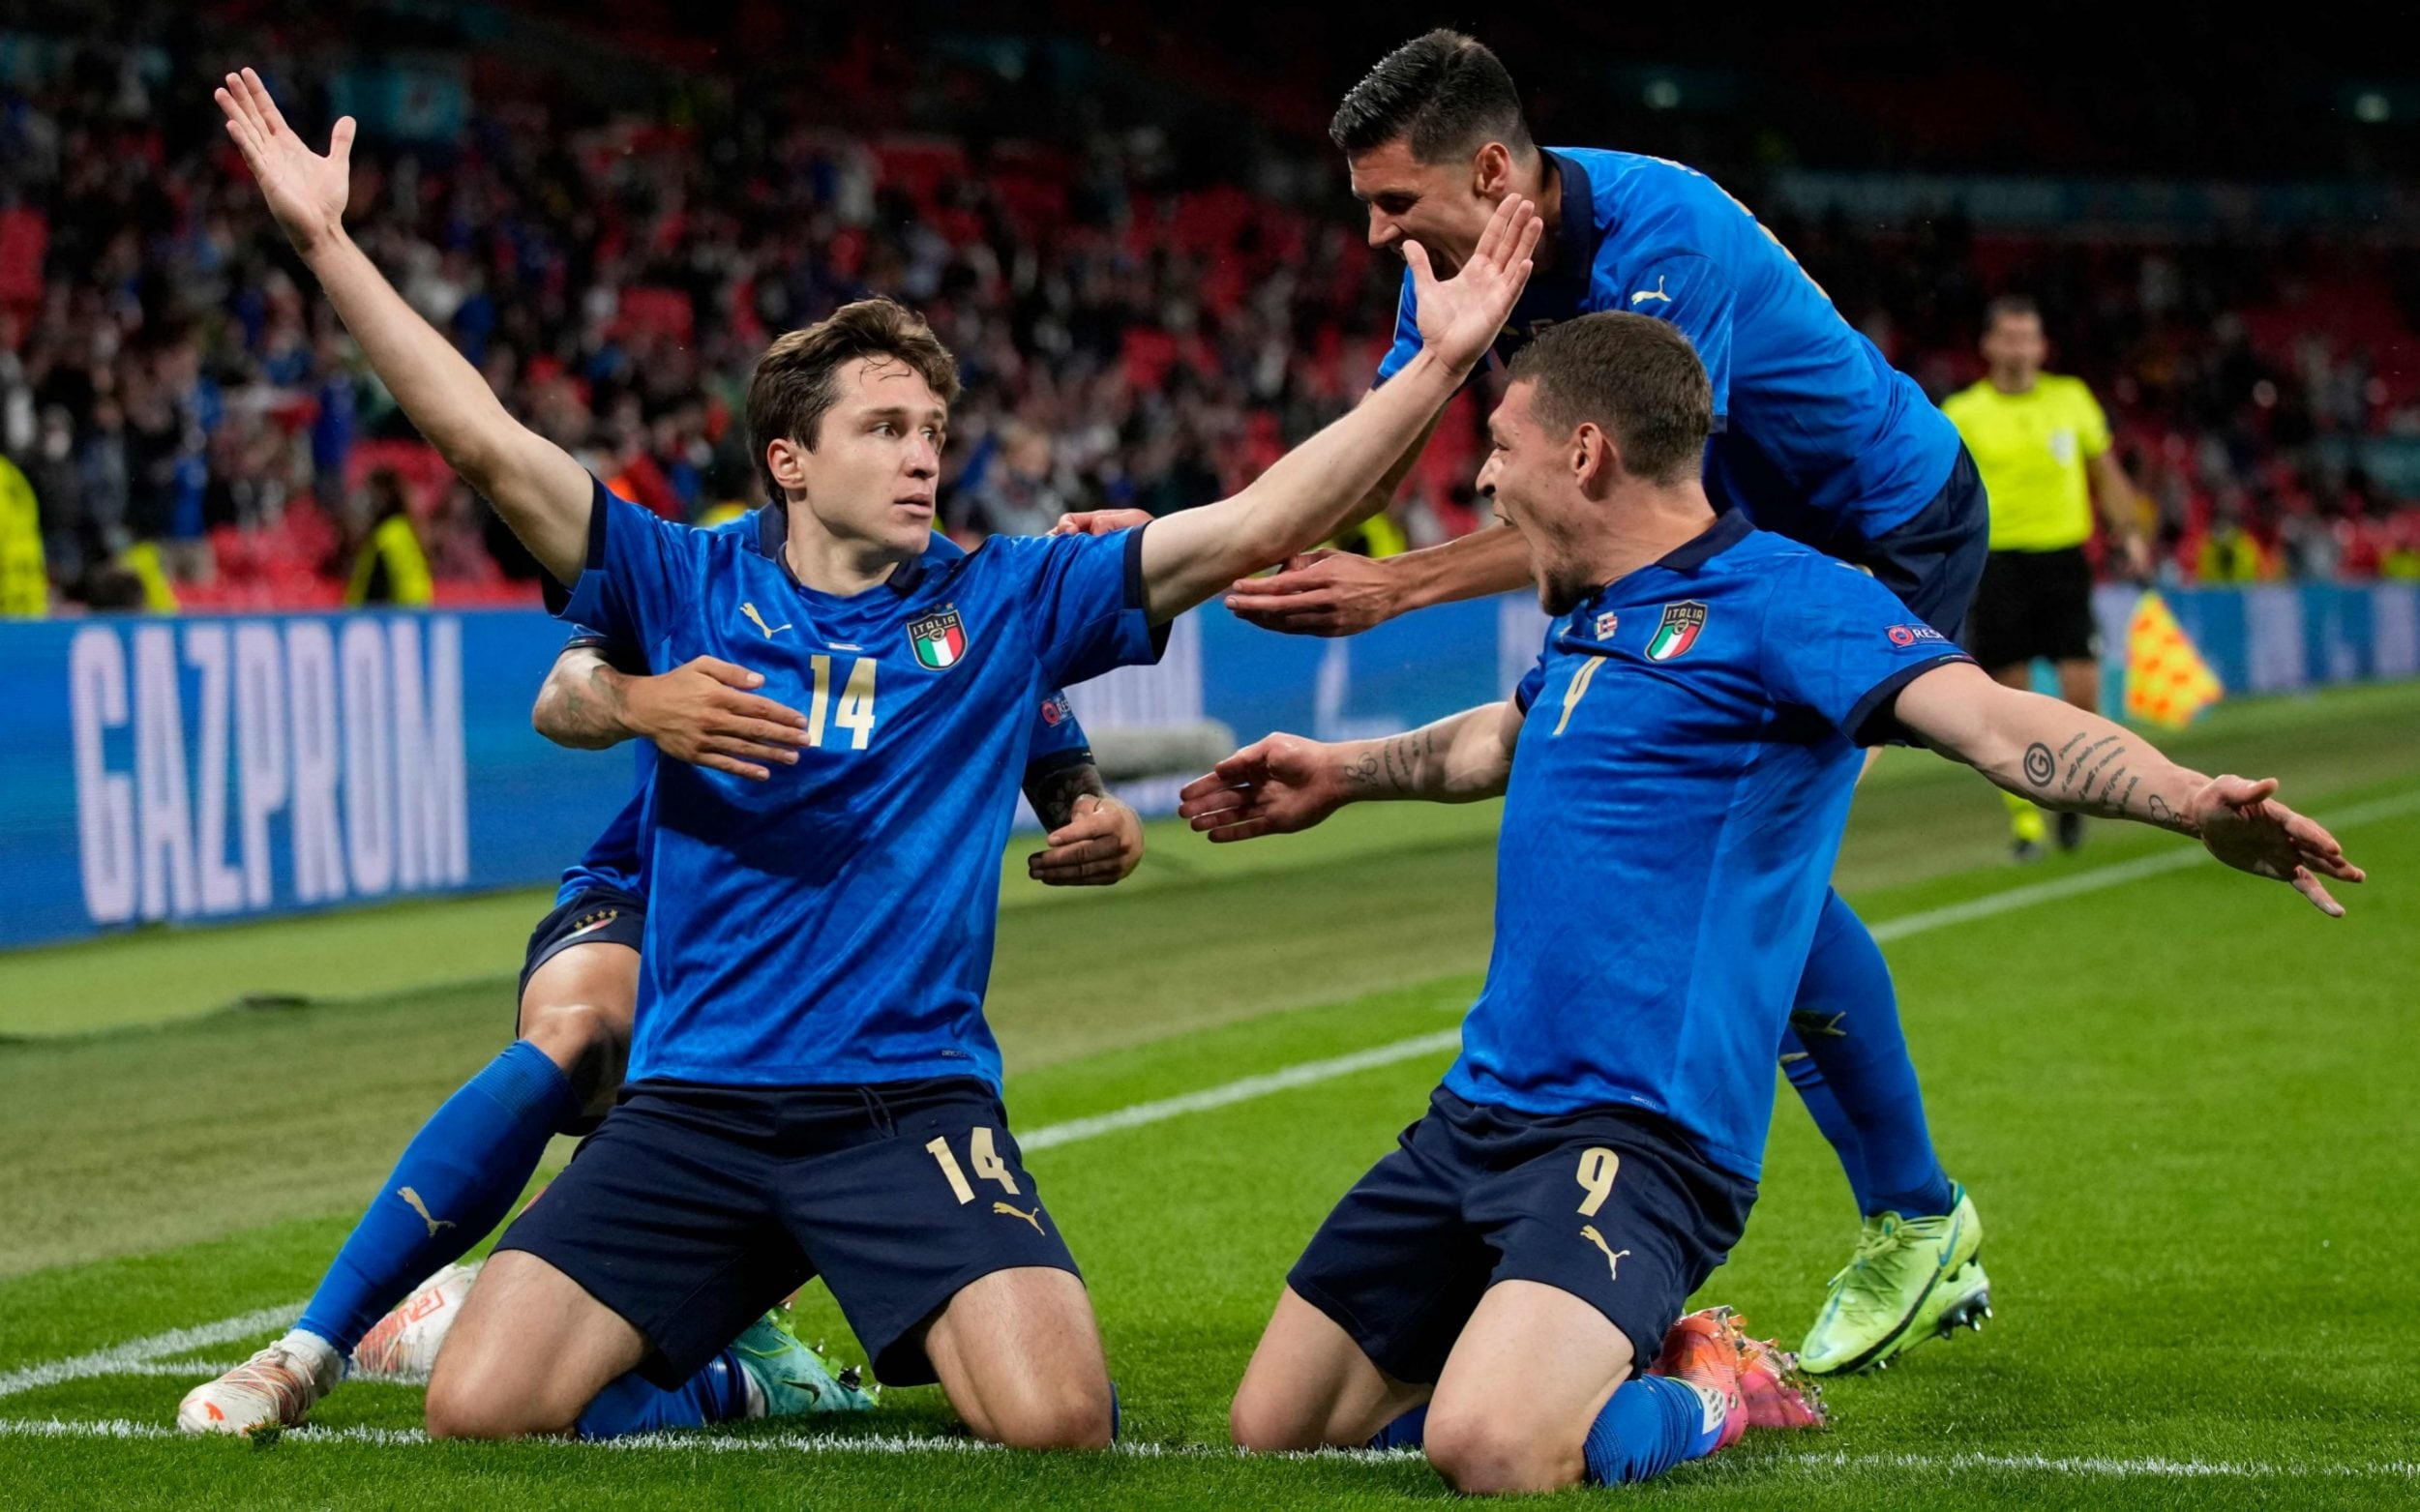 Euro 2020: Italy Defeat Austria to Qualify for Quarter-Finals